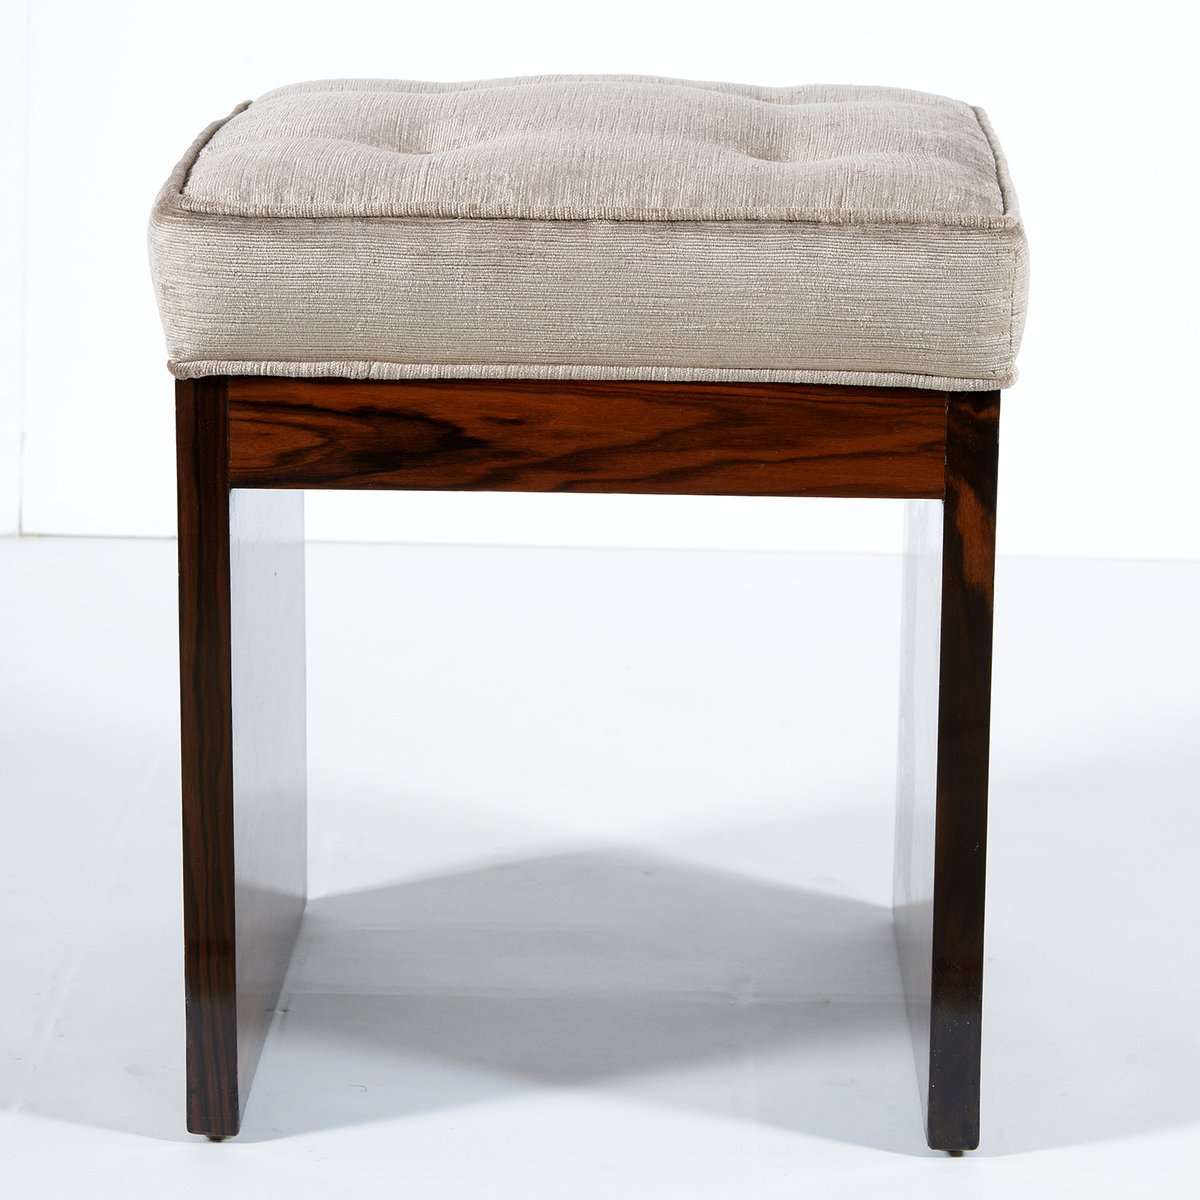 italienische art deco hocker 1930er 2er set bei pamono kaufen. Black Bedroom Furniture Sets. Home Design Ideas